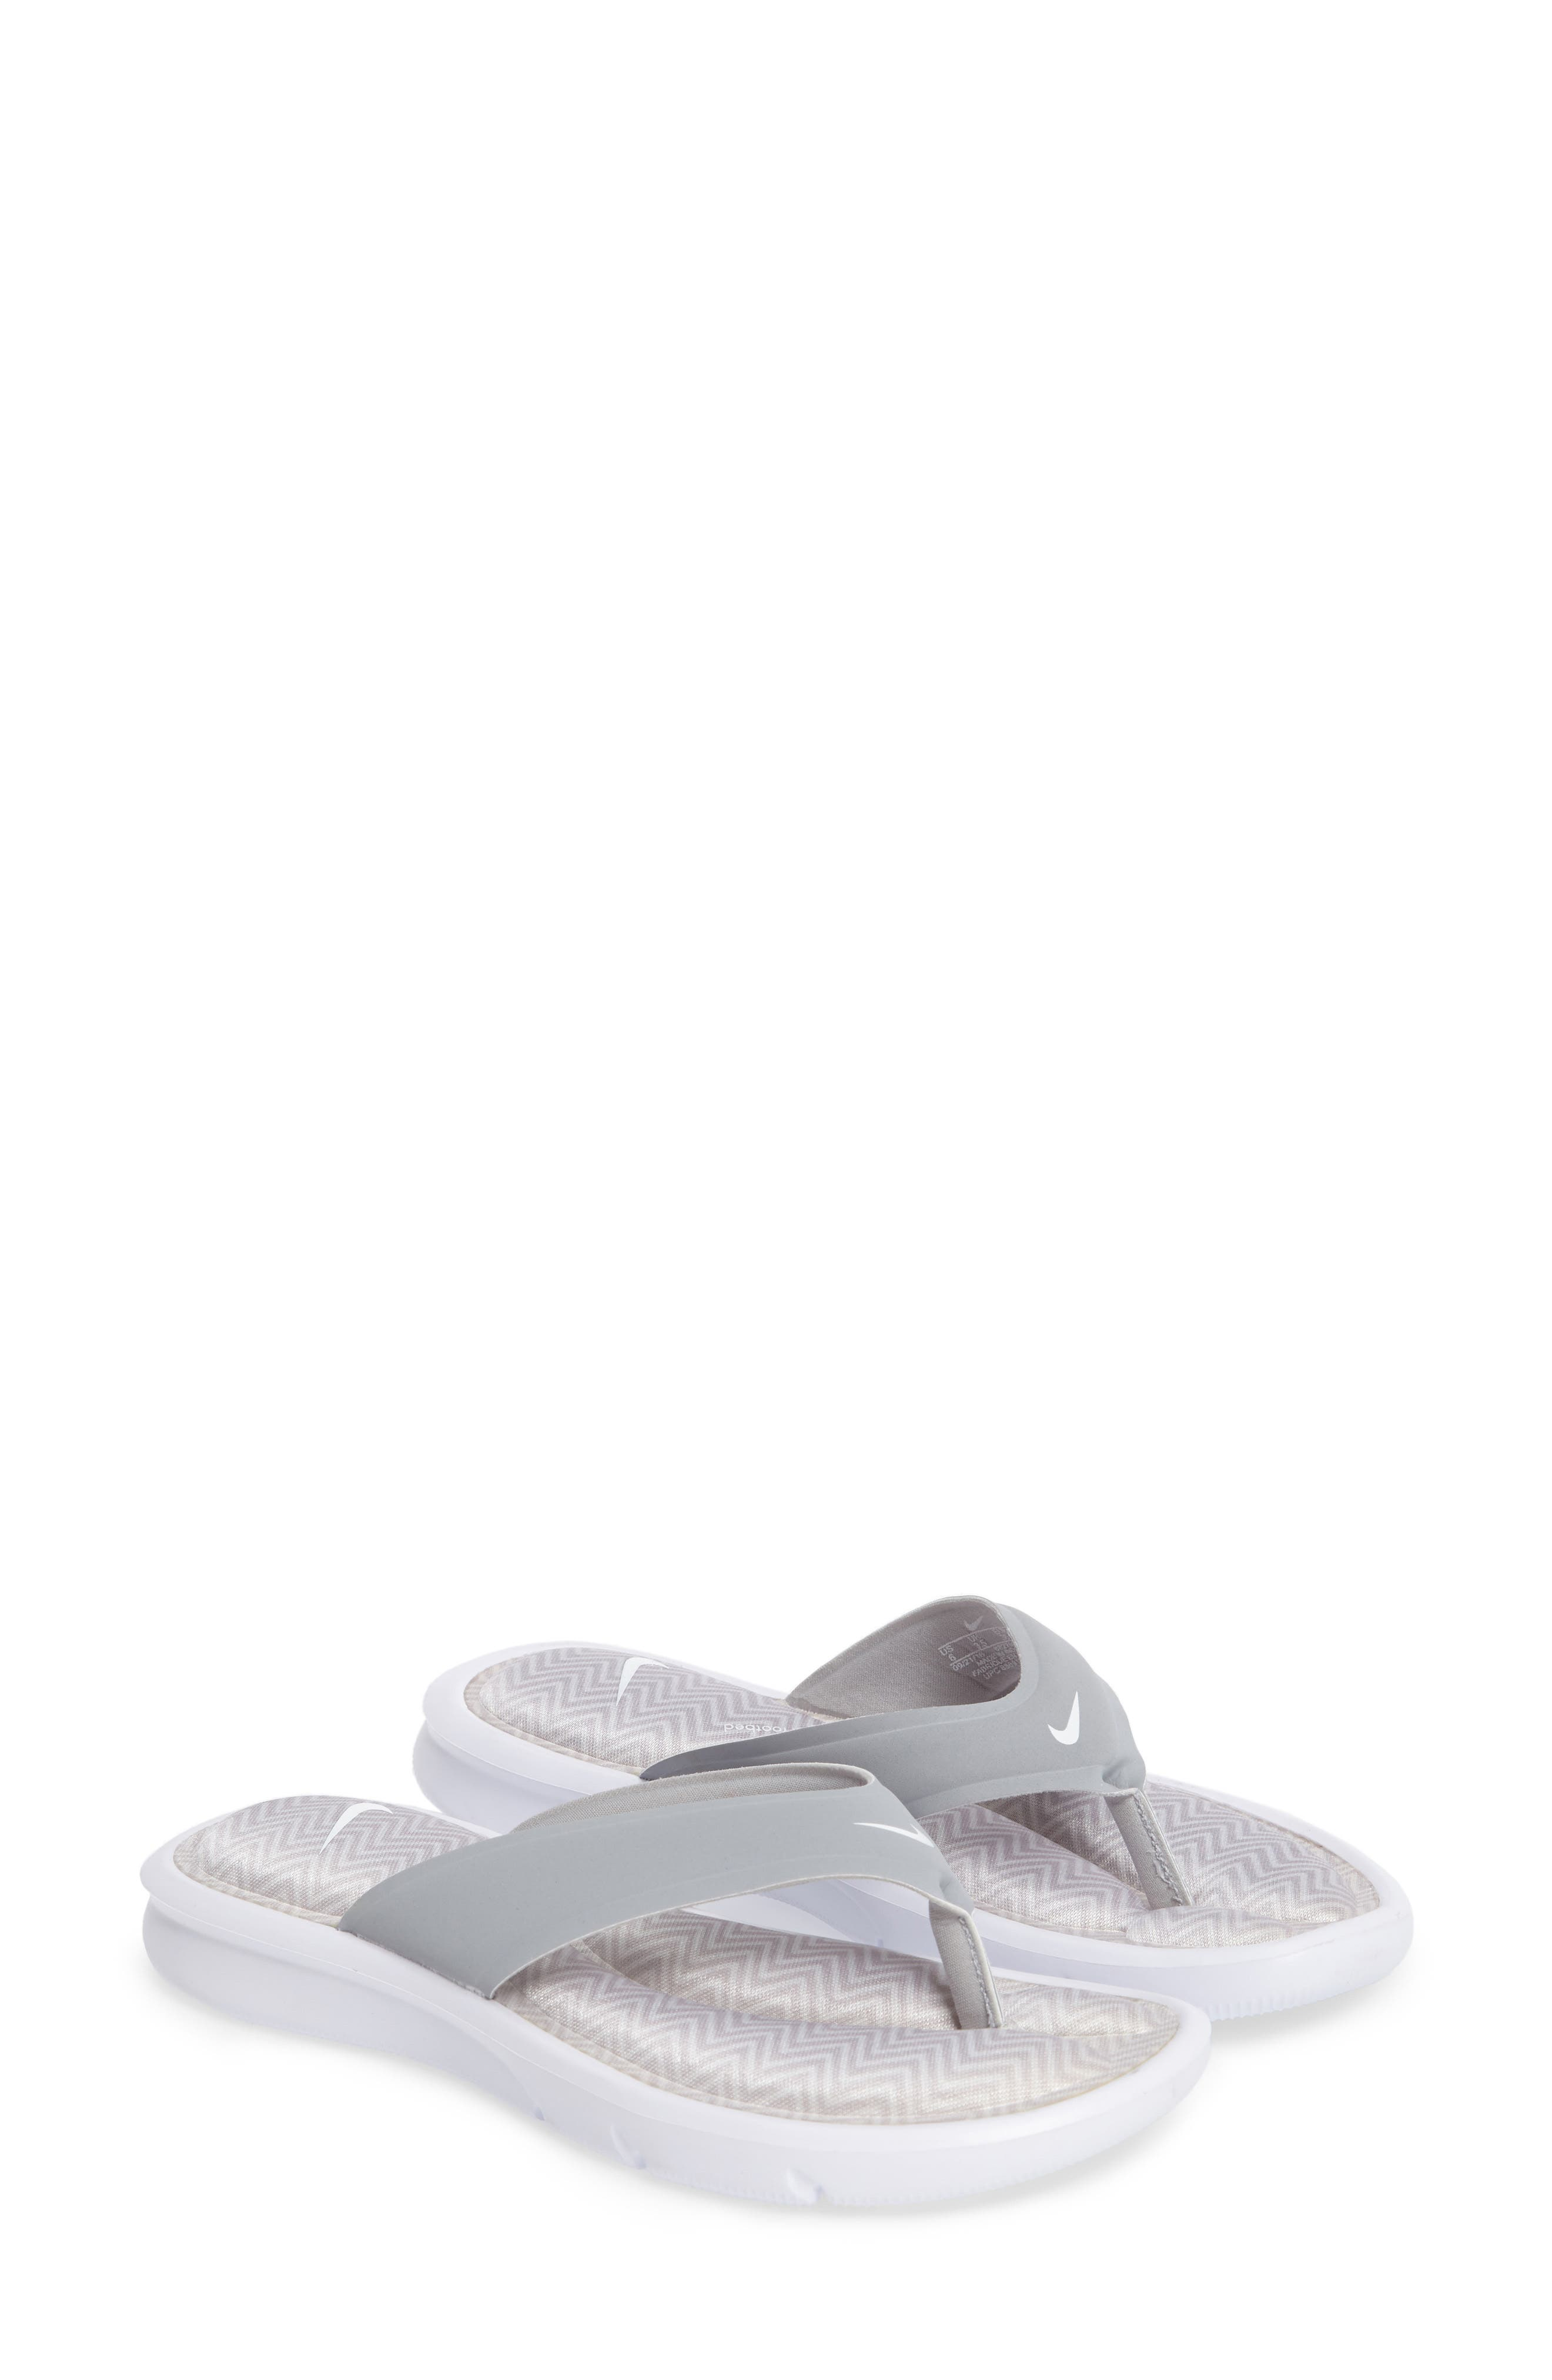 NIKE Ultra Comfort Thong Sandal